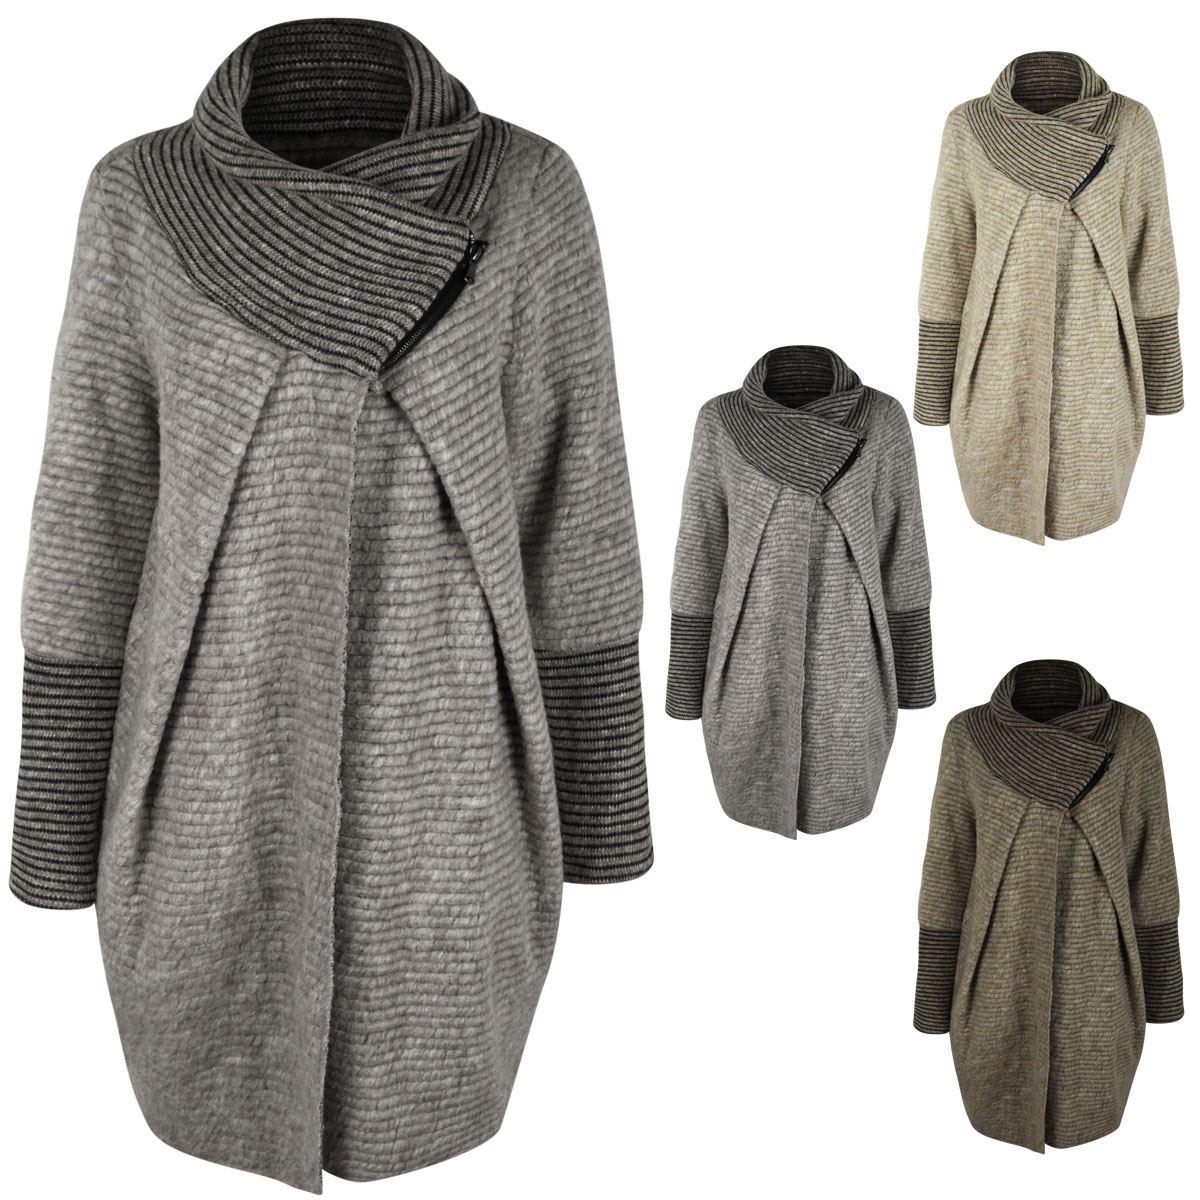 femme surdimensionn wrap cardigan baggy col roul pull veste laine manteau ebay. Black Bedroom Furniture Sets. Home Design Ideas